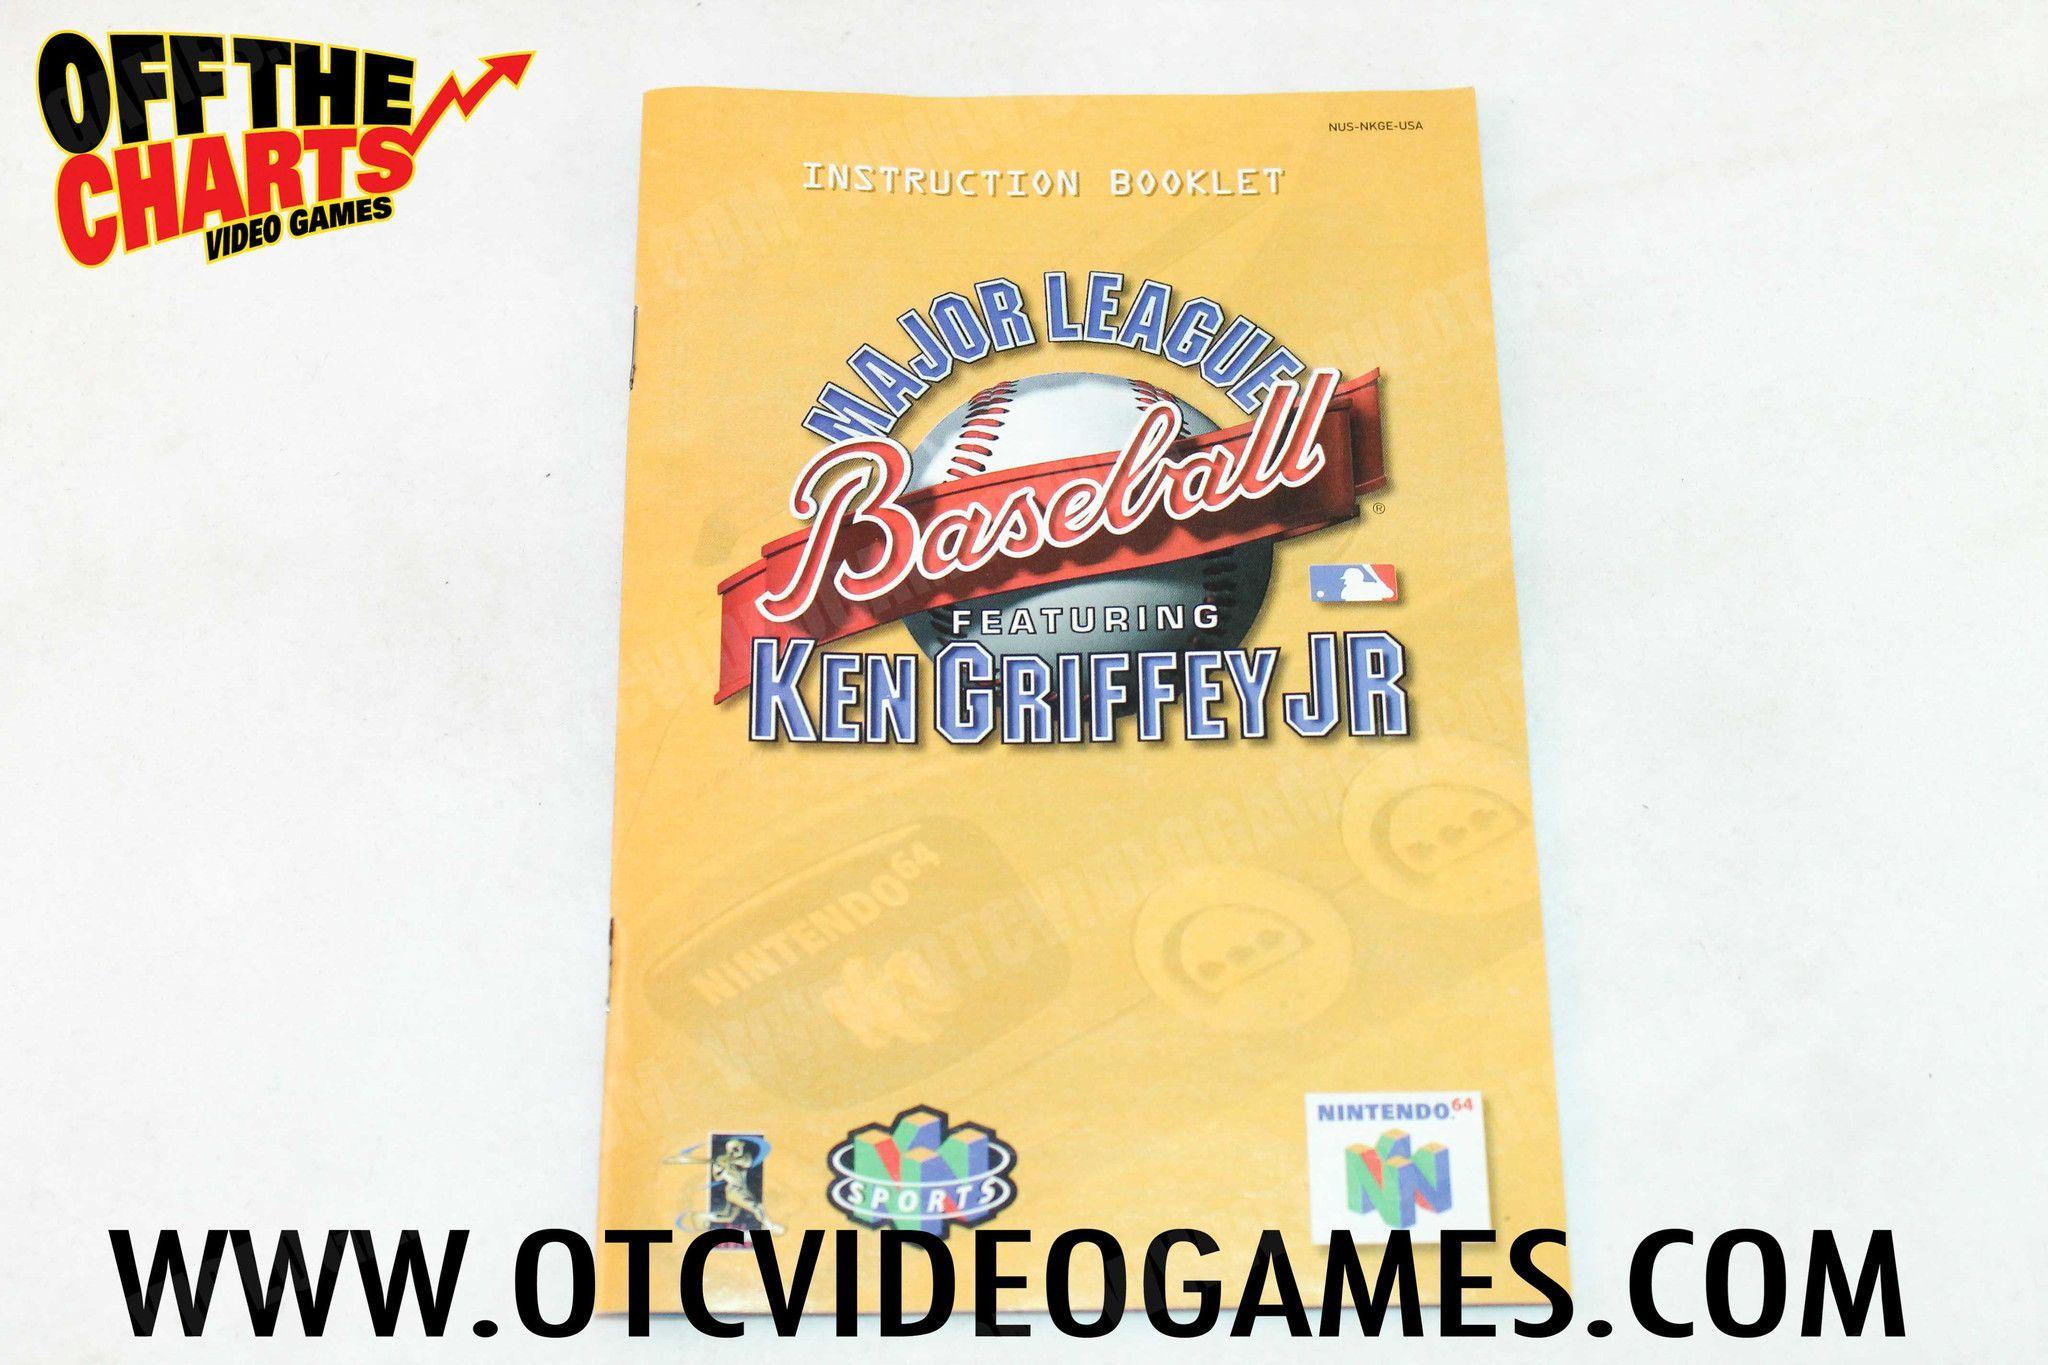 Major League Baseball featuring Ken Griffey Jr. Manual